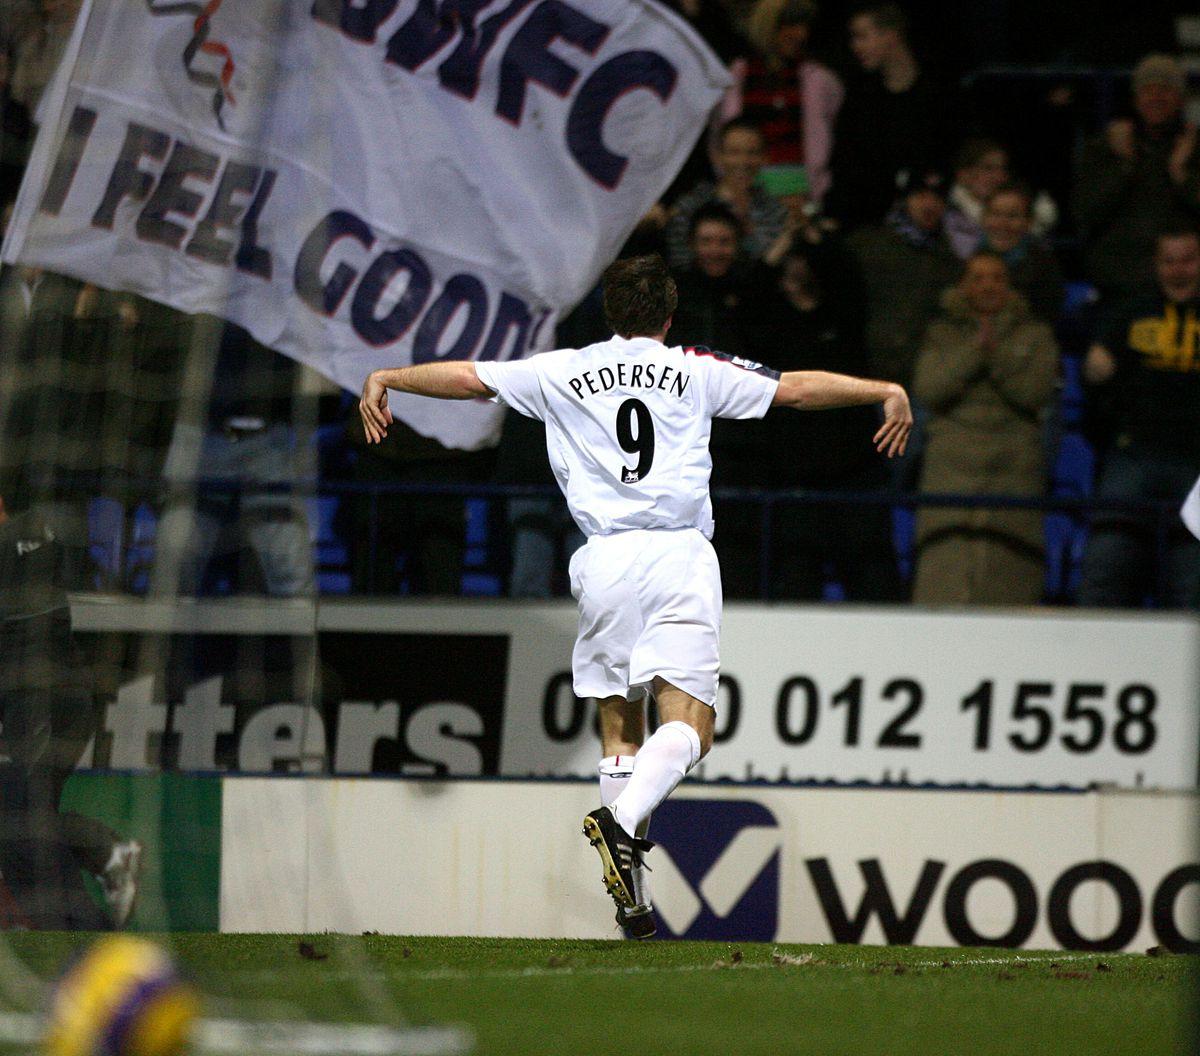 Soccer - FA Barclays Premiership - Bolton Wanderers v Charlton Athletic - The Reebok Stadium